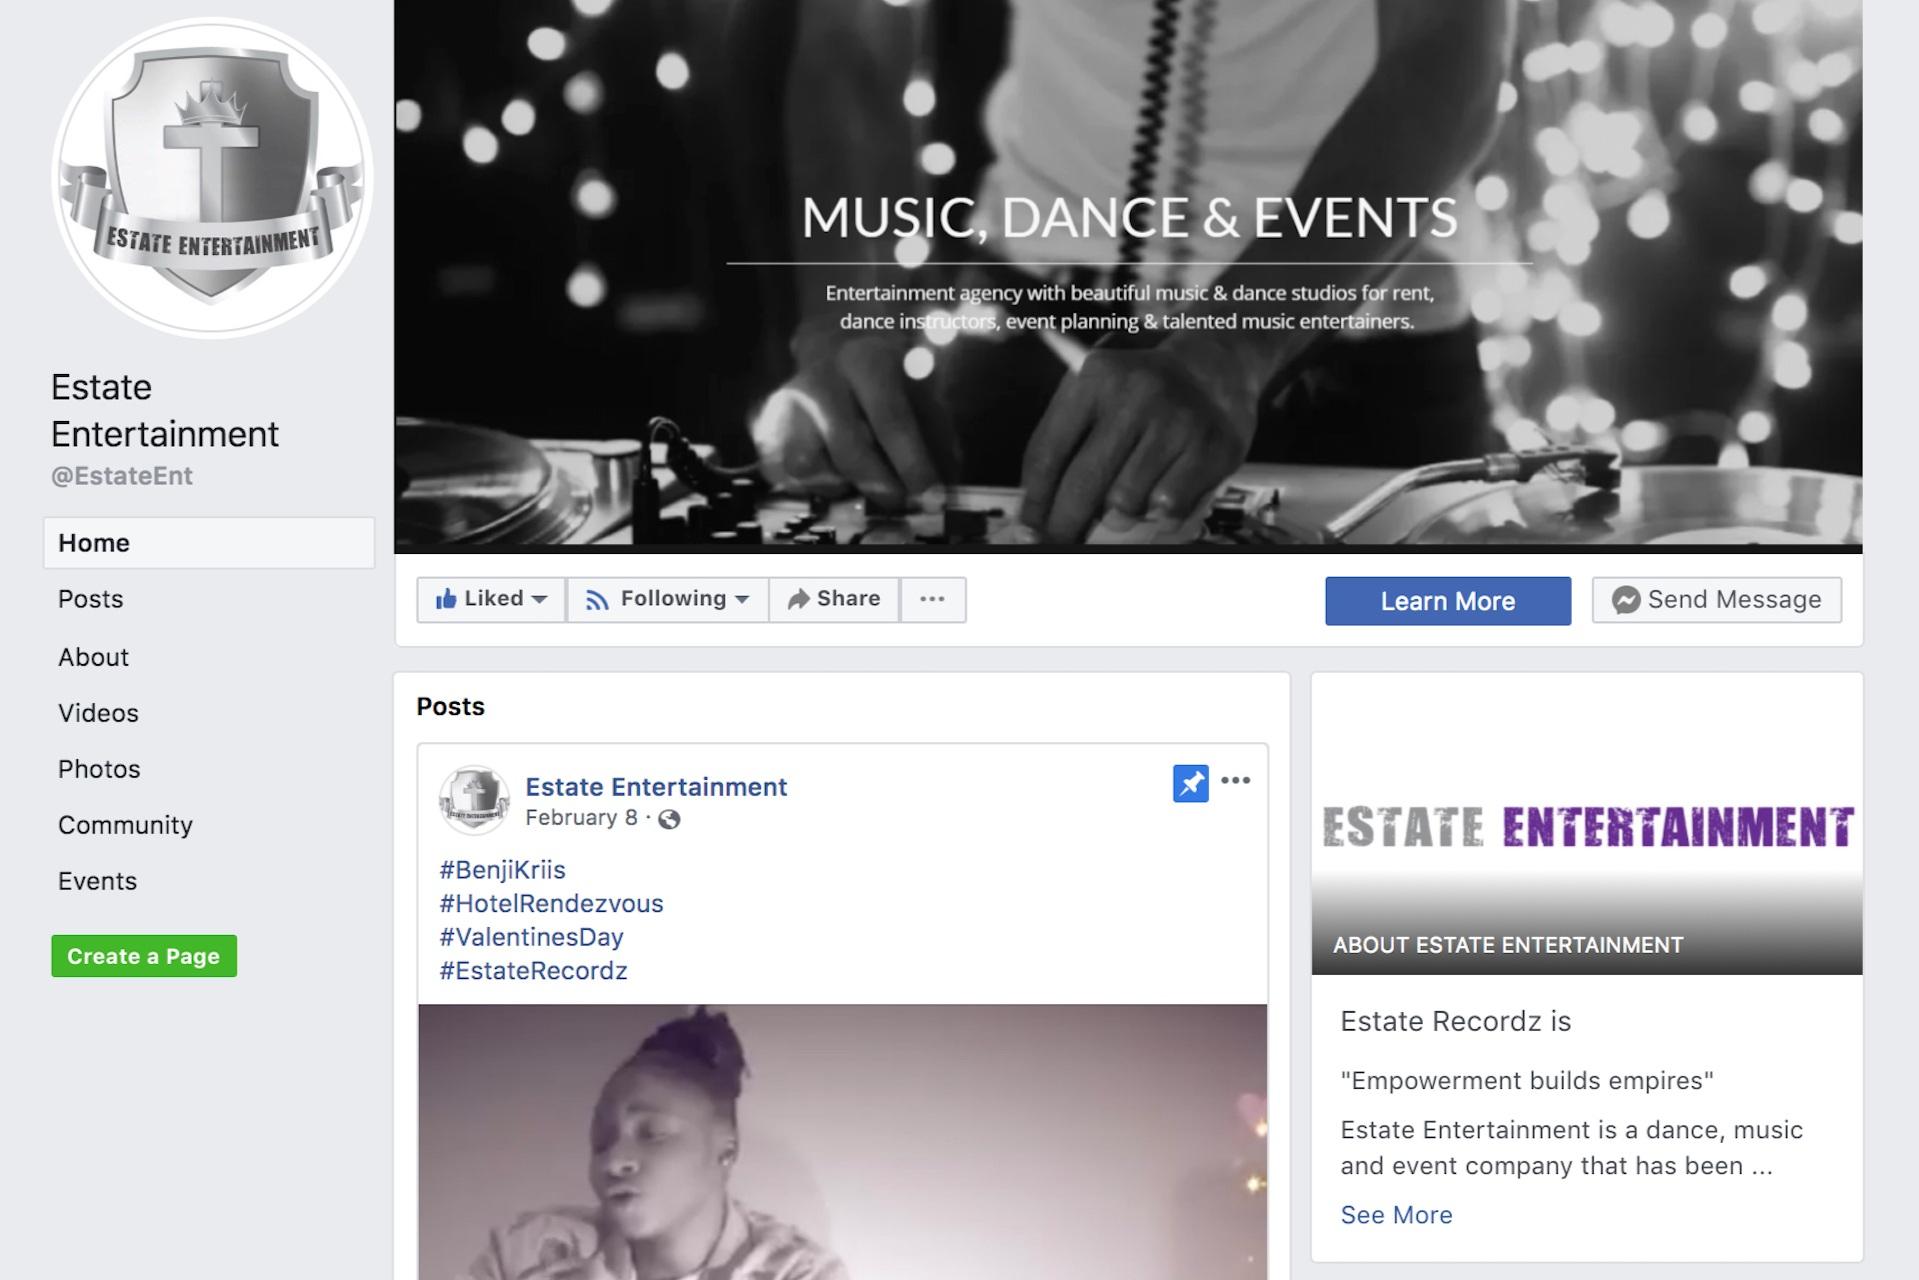 facebook.com/EstateEnt